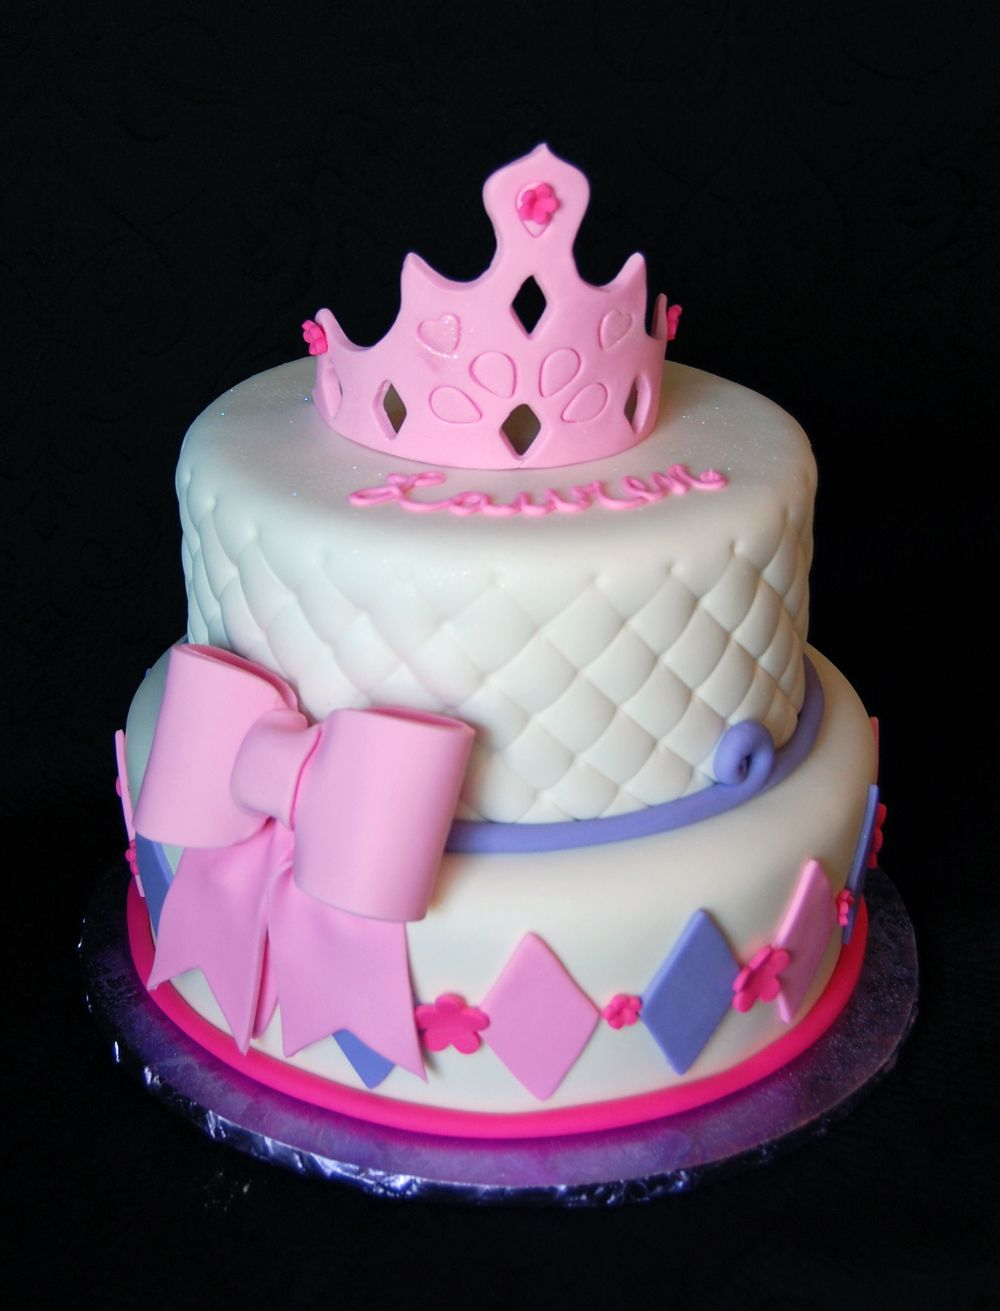 Childrens Birthday Cakes Princess themed girls birthday cake in